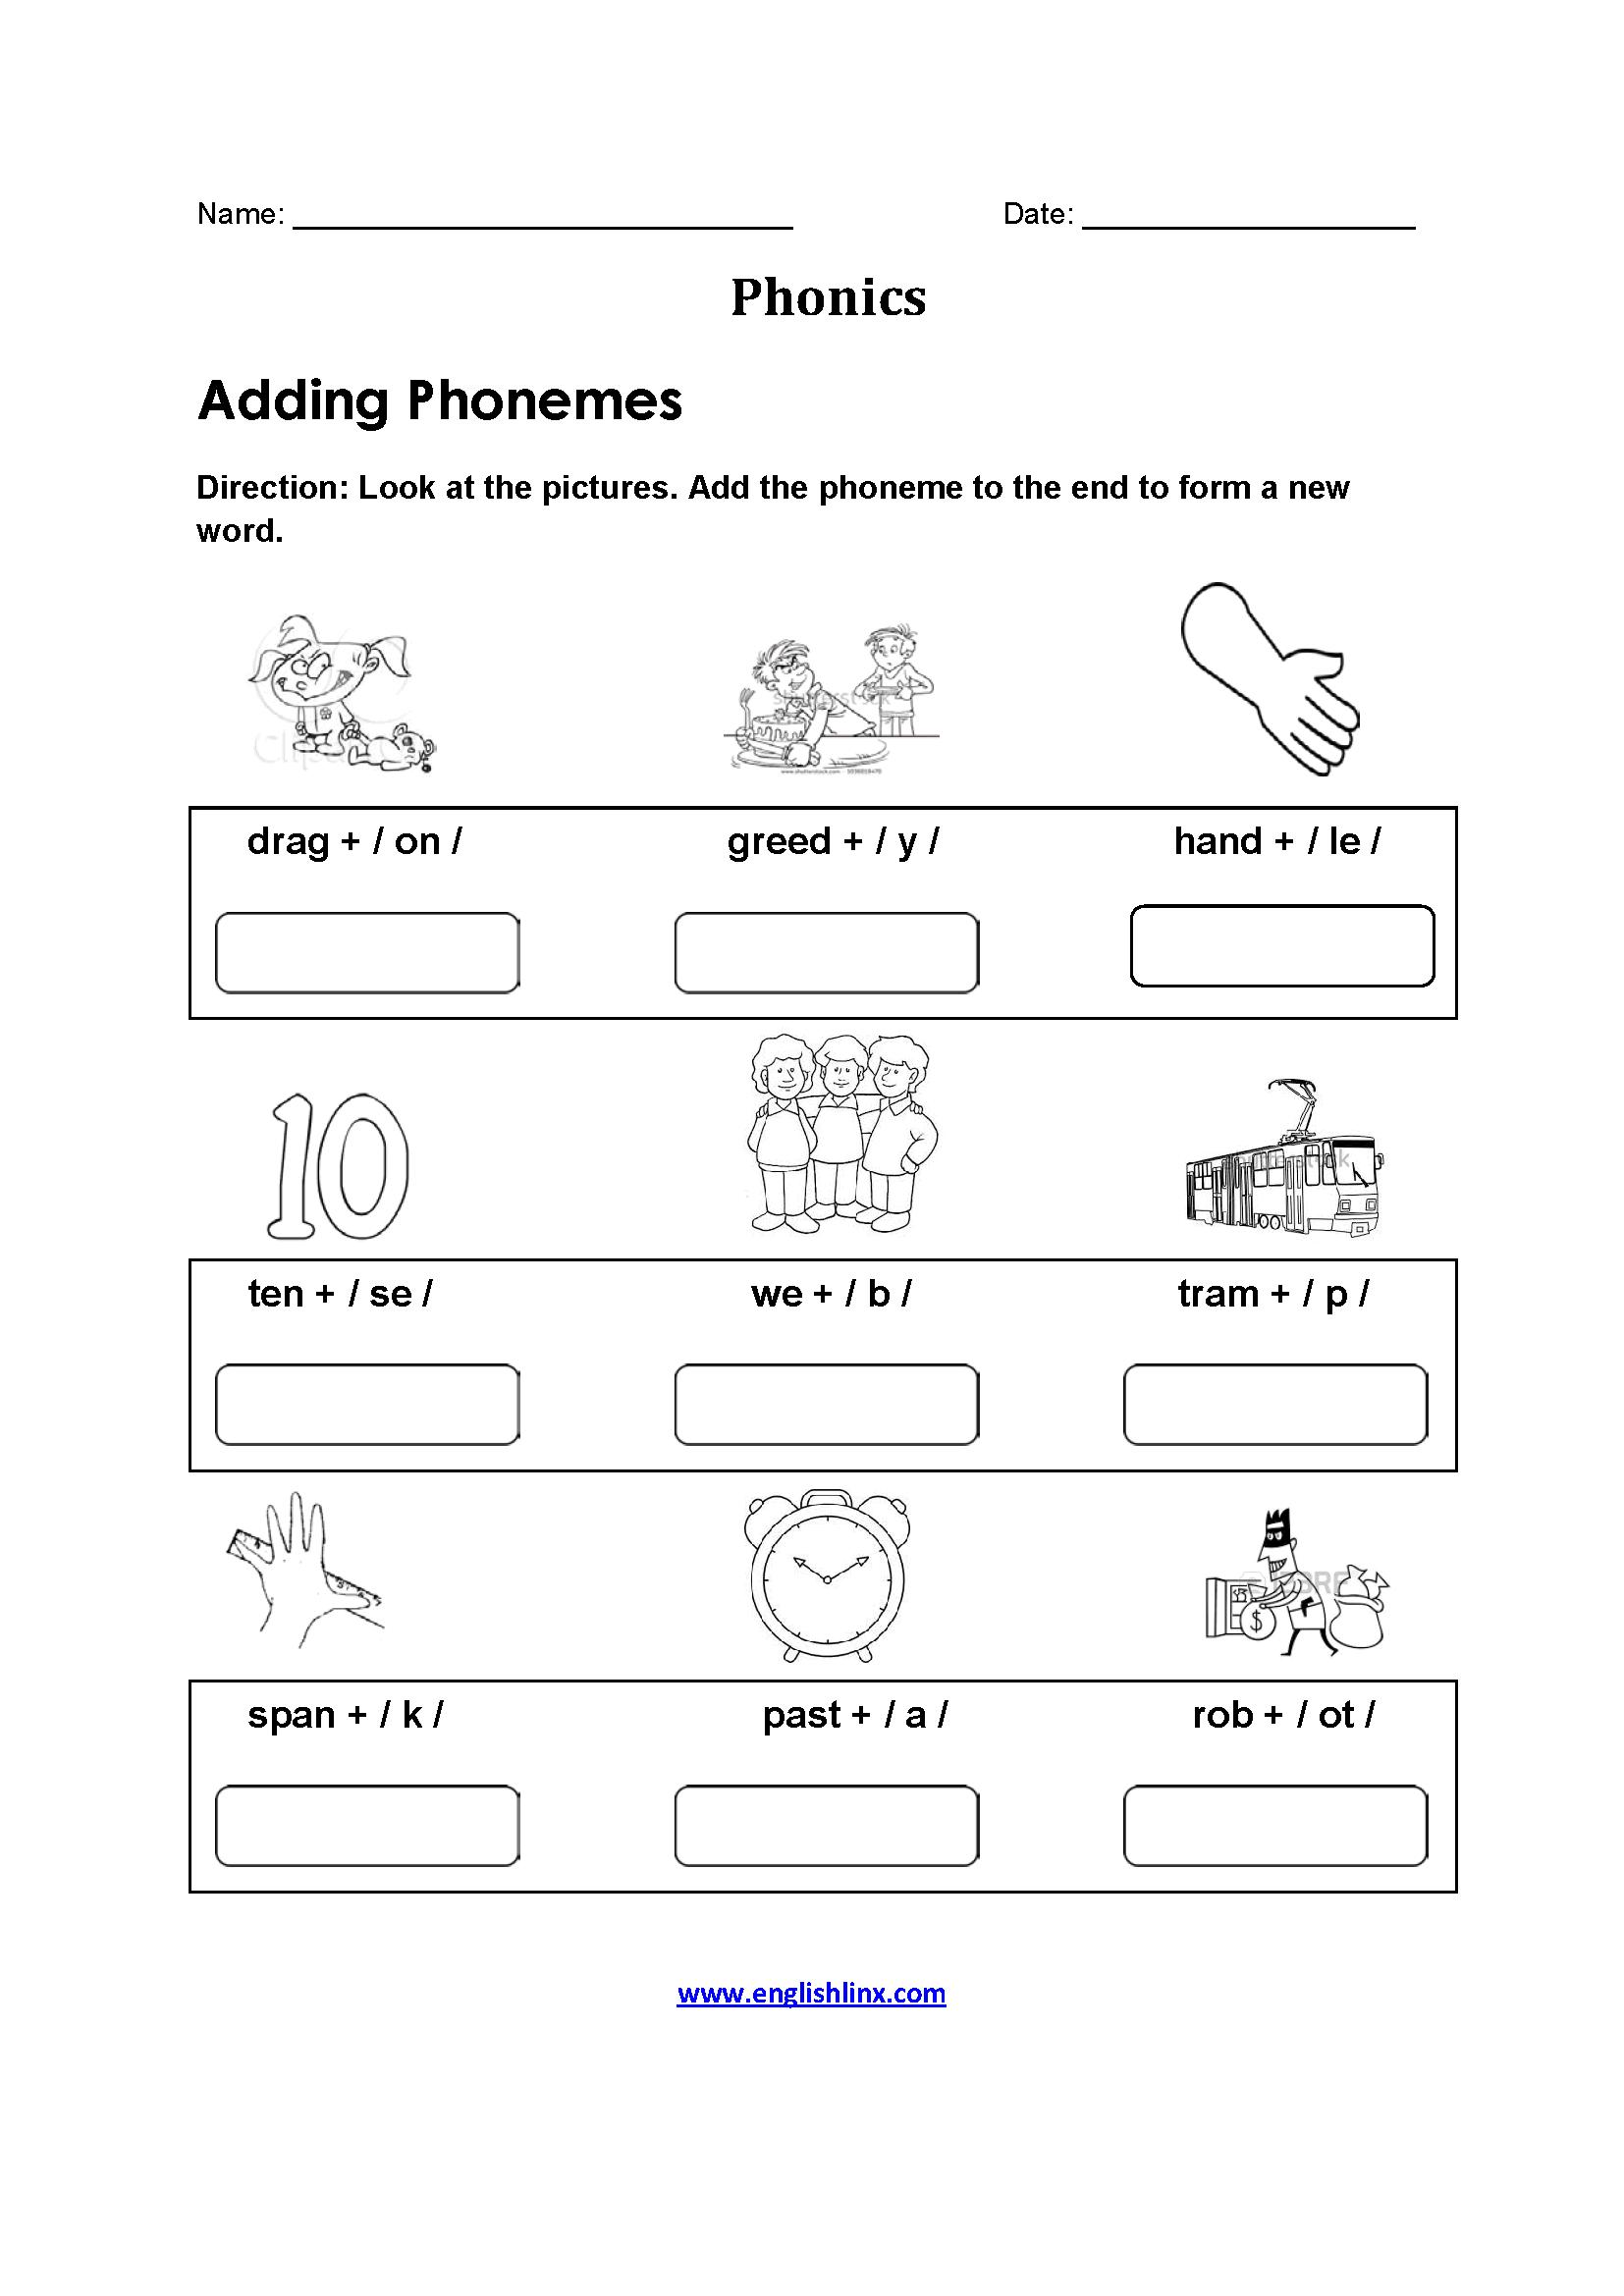 Adding Phonemes Phonics Worksheets